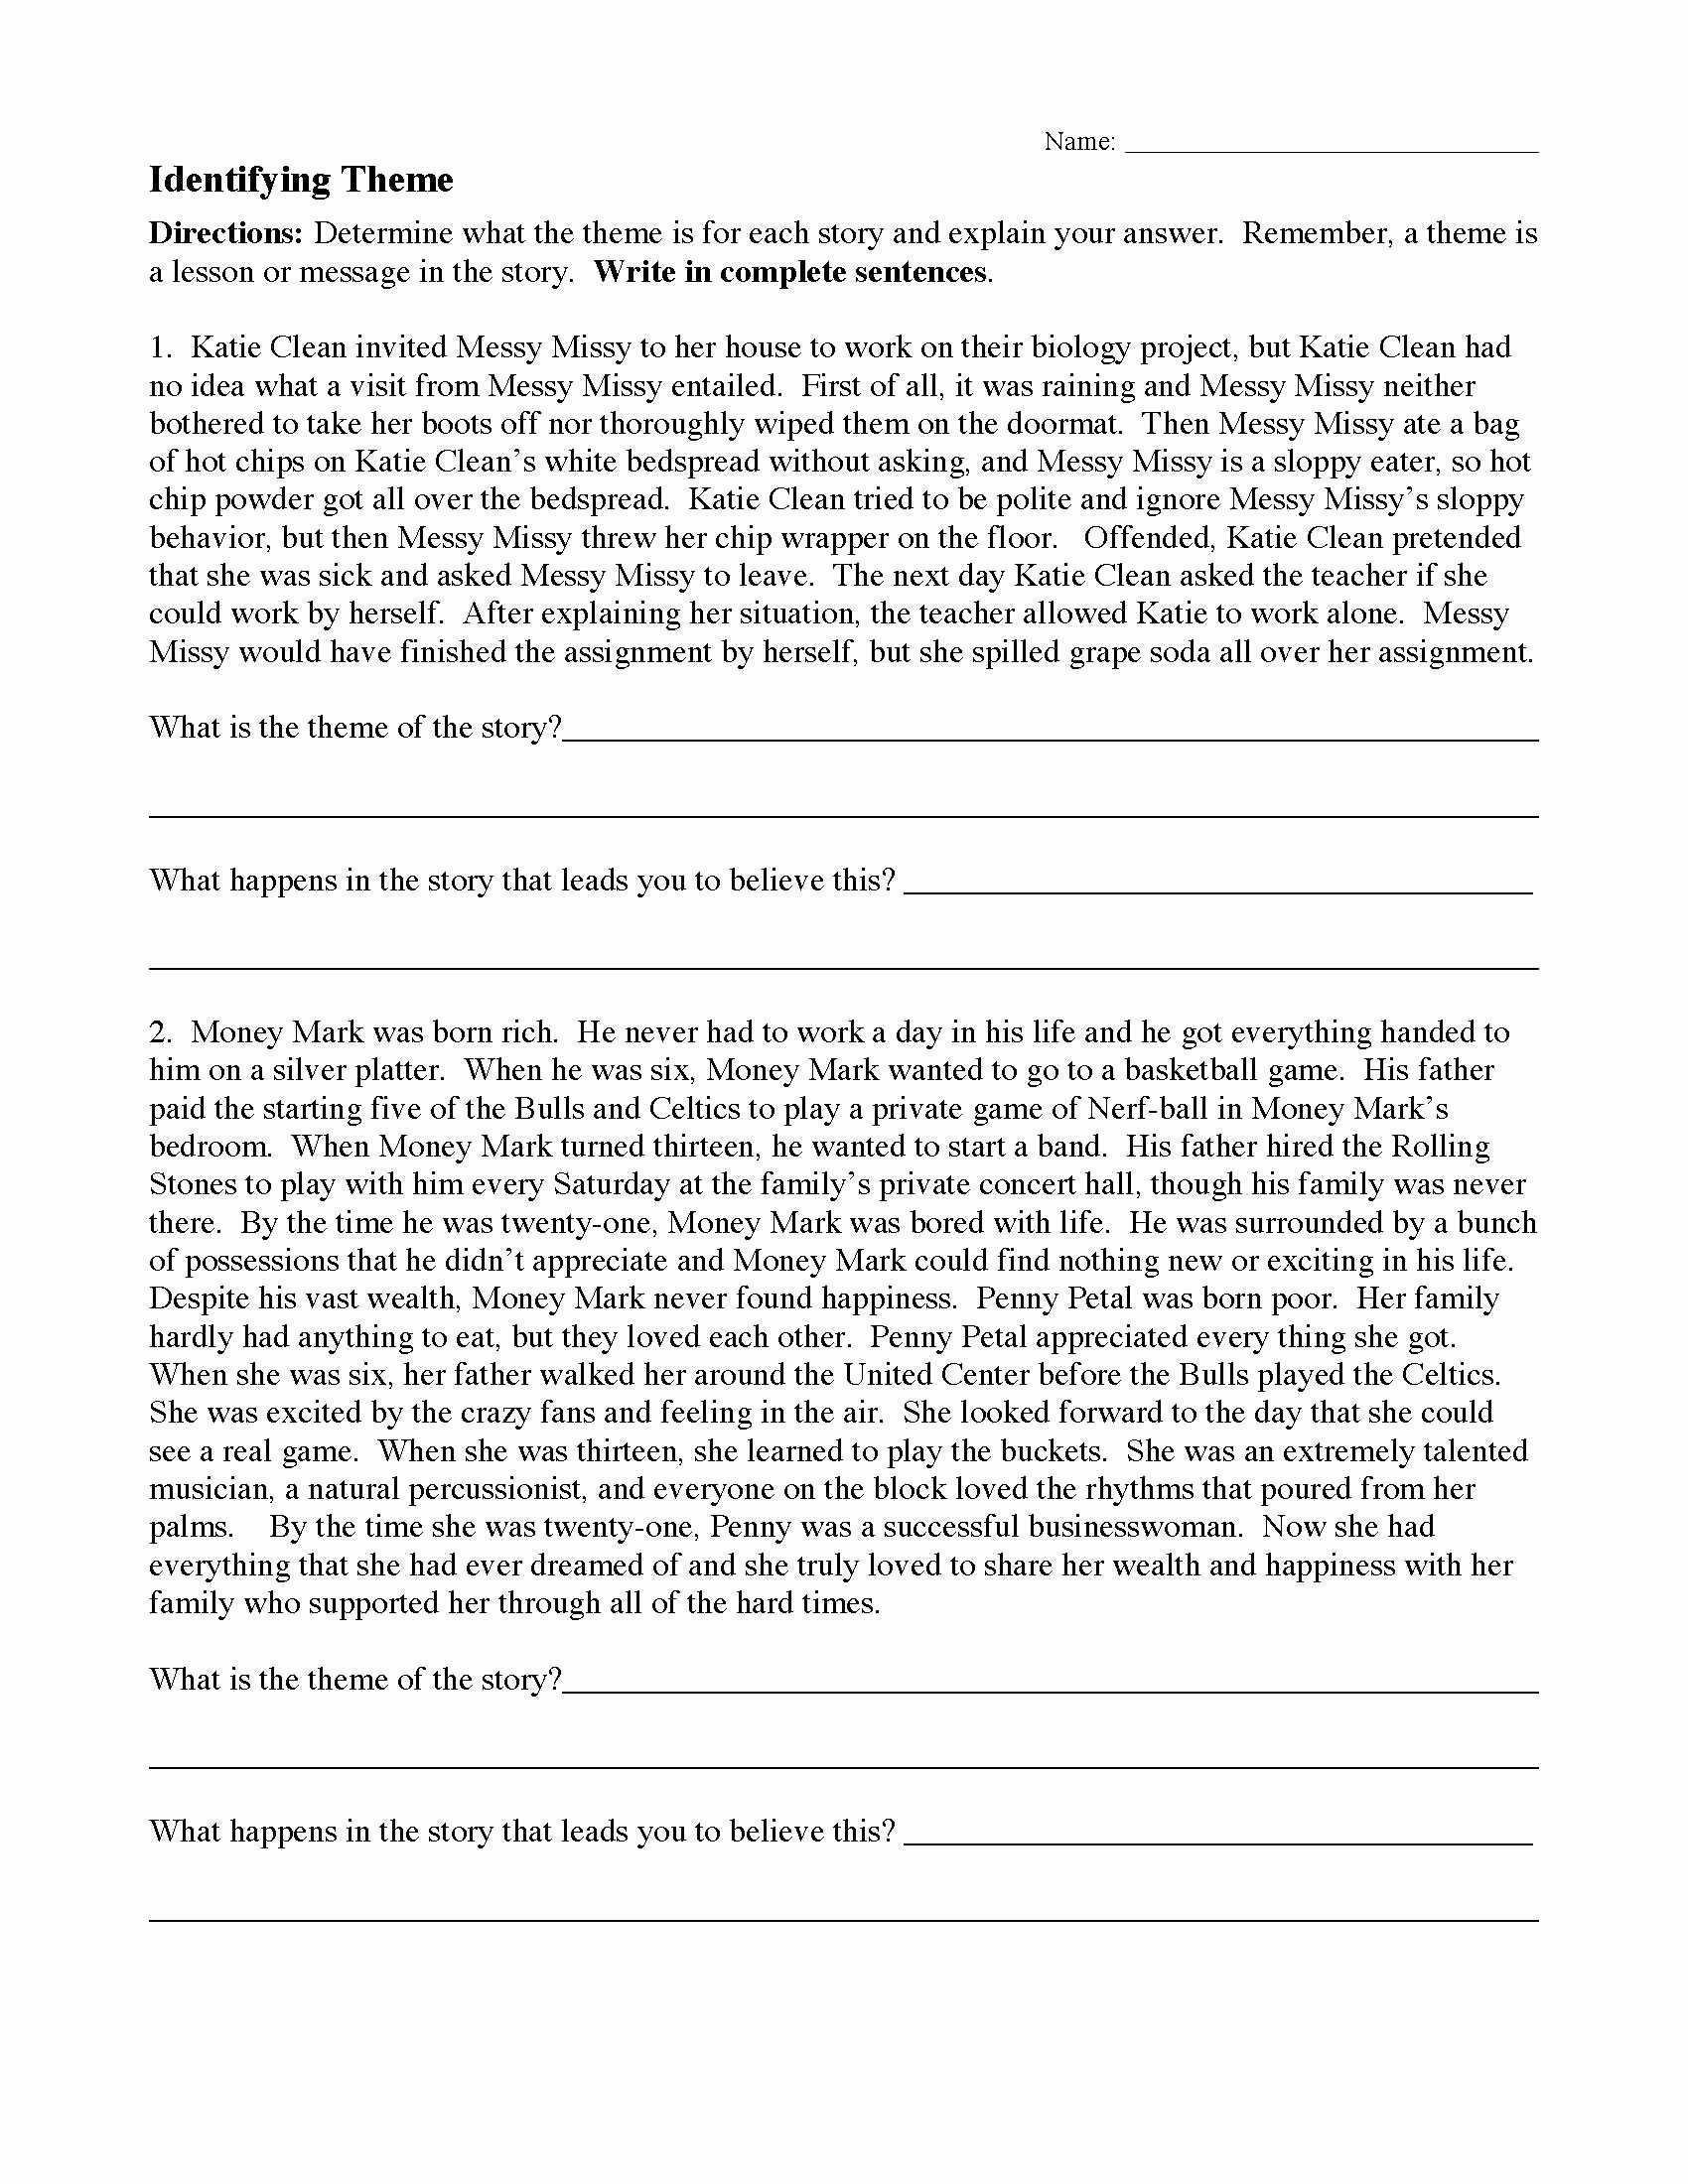 Identifying theme Worksheet Elegant theme Worksheet 1